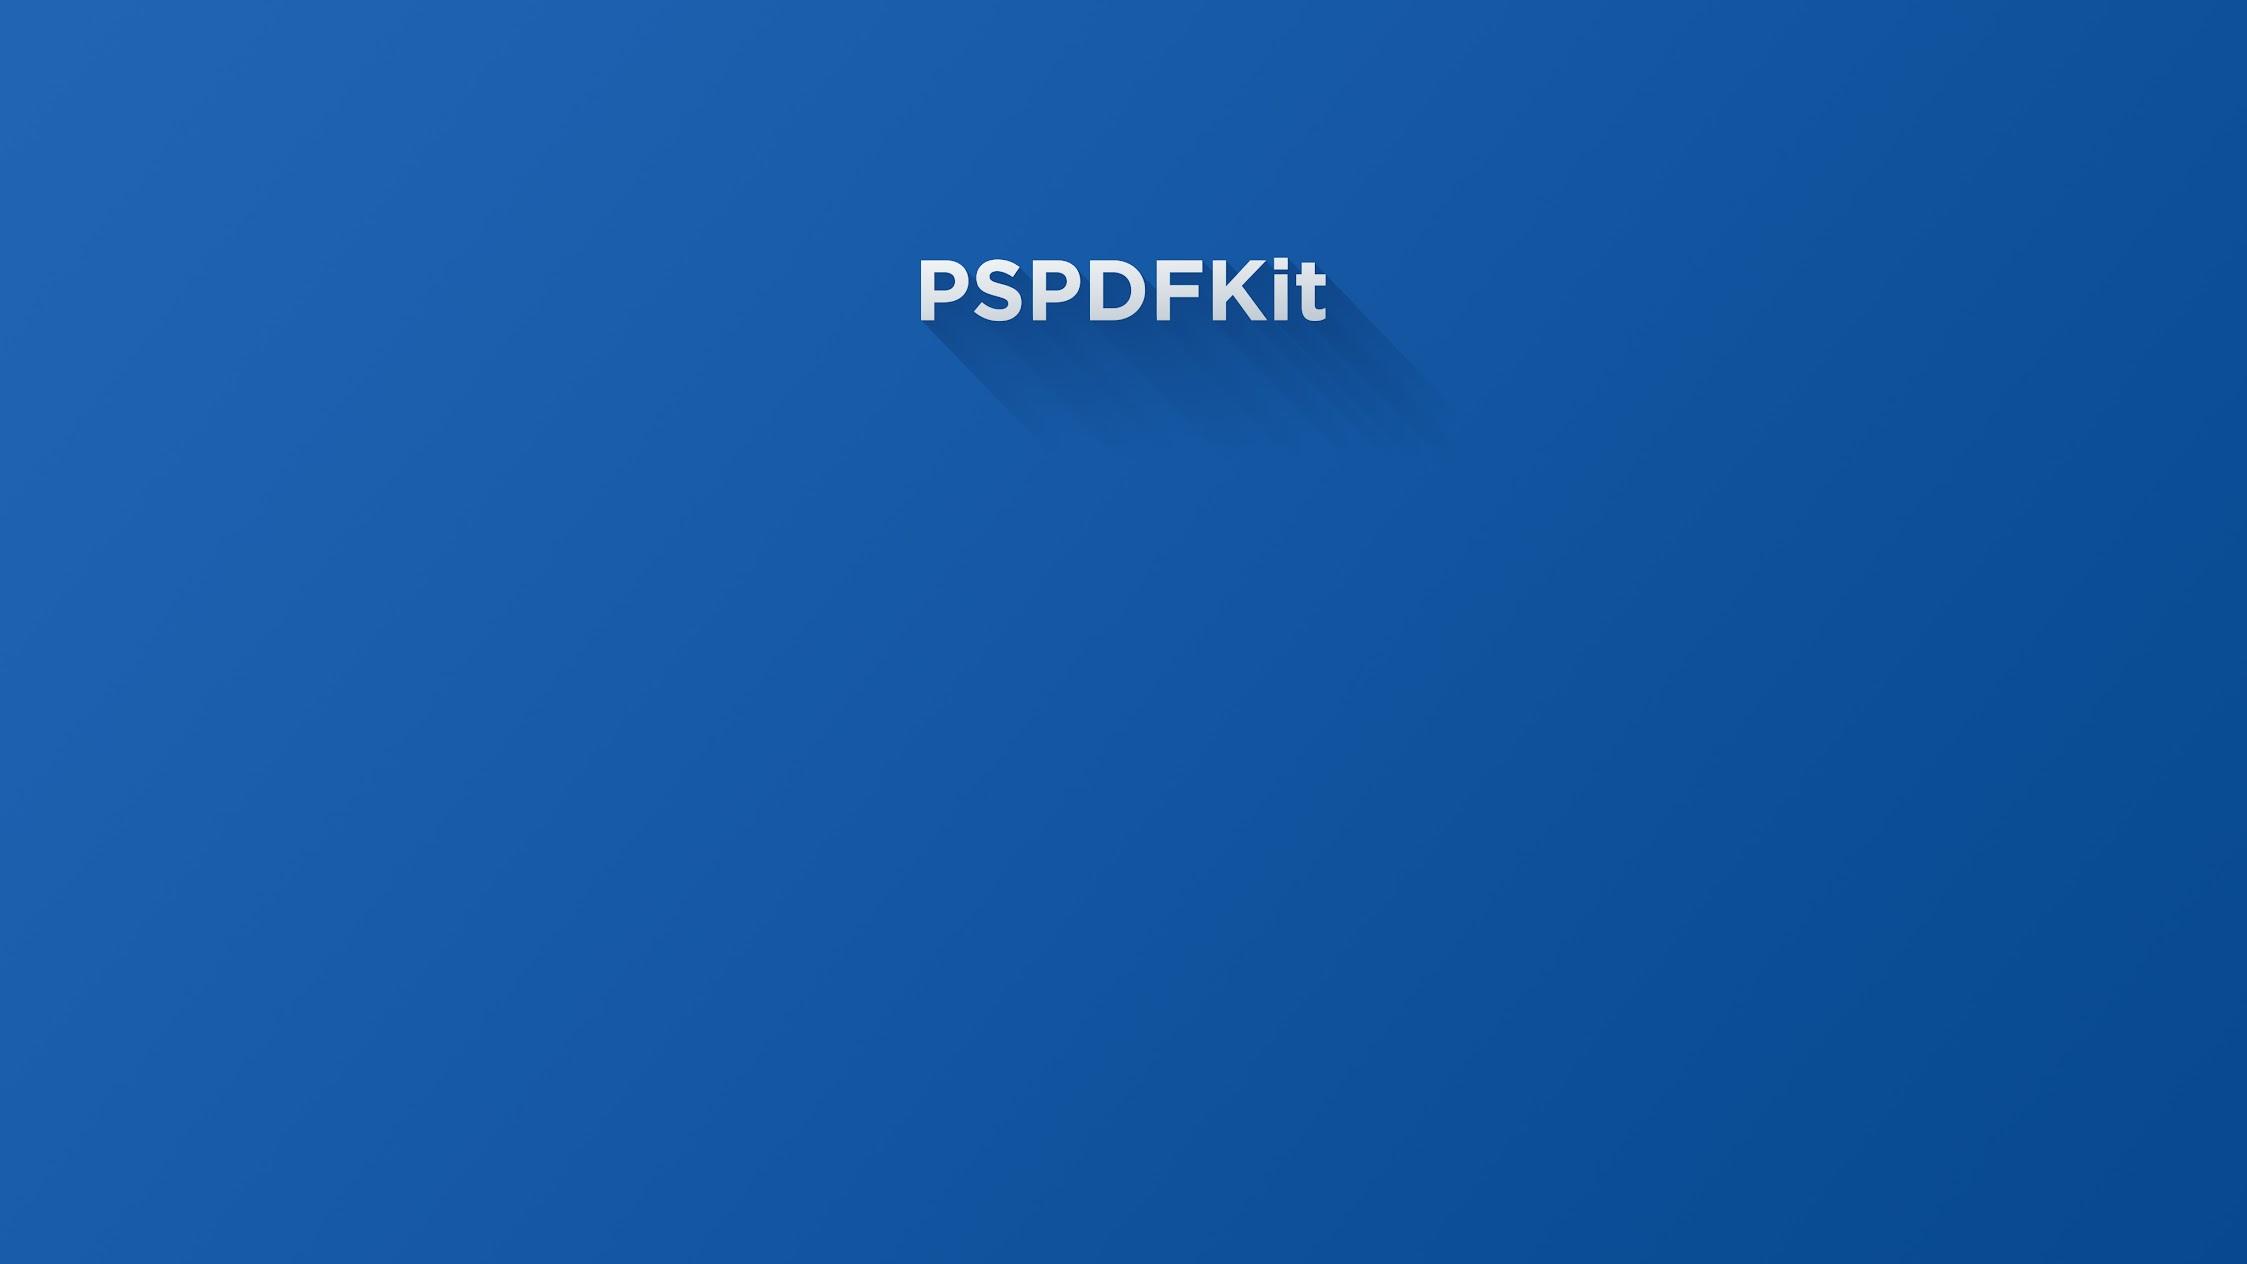 PSPDFKit GmbH